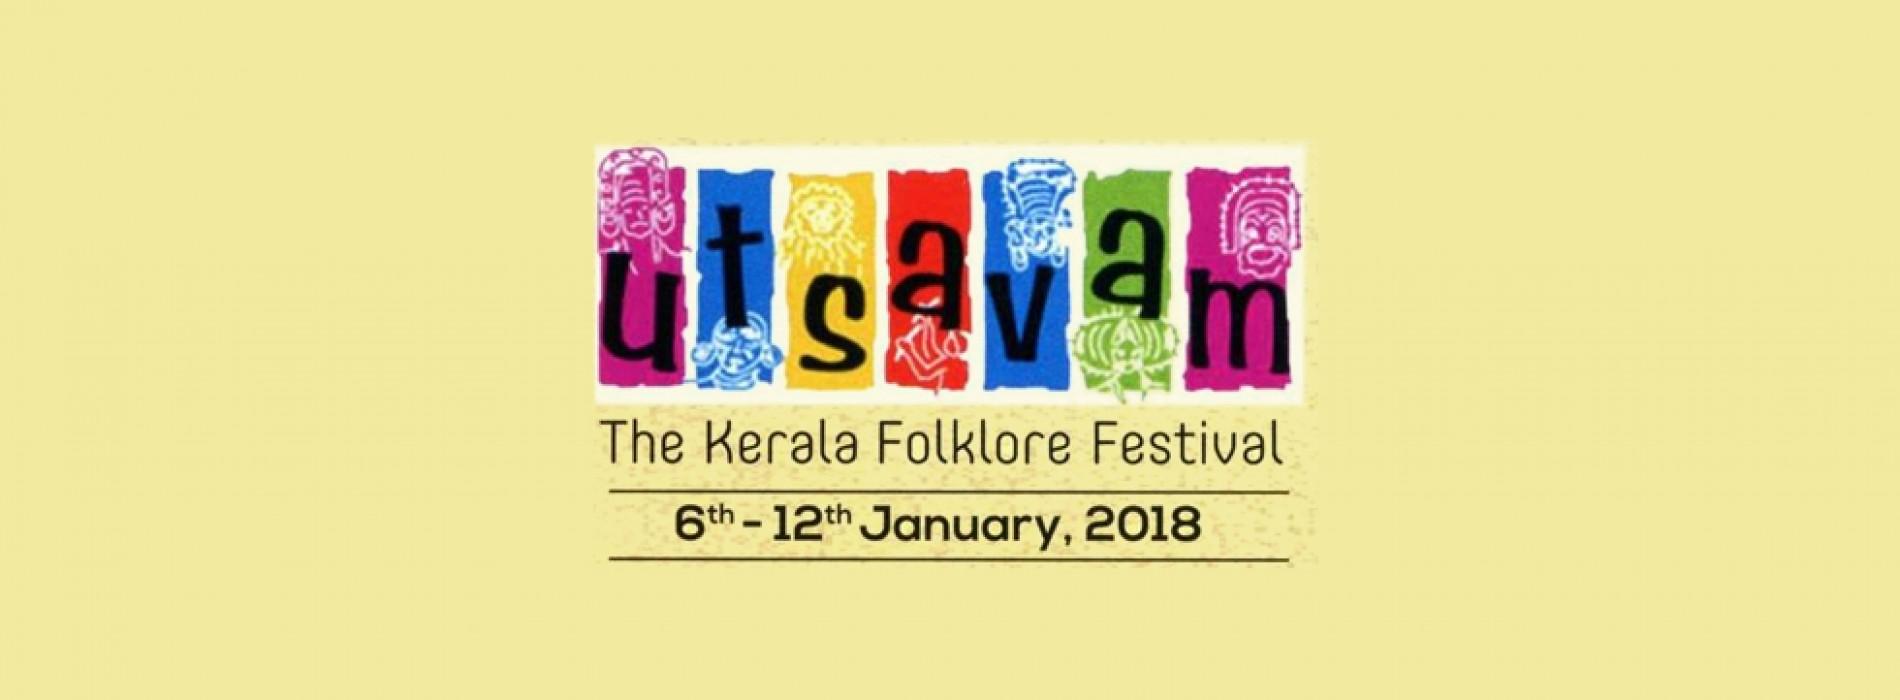 Utsavam 2018 to bring Kerala's Traditional Folk Arts to 28 Venues; To Begin on January 6